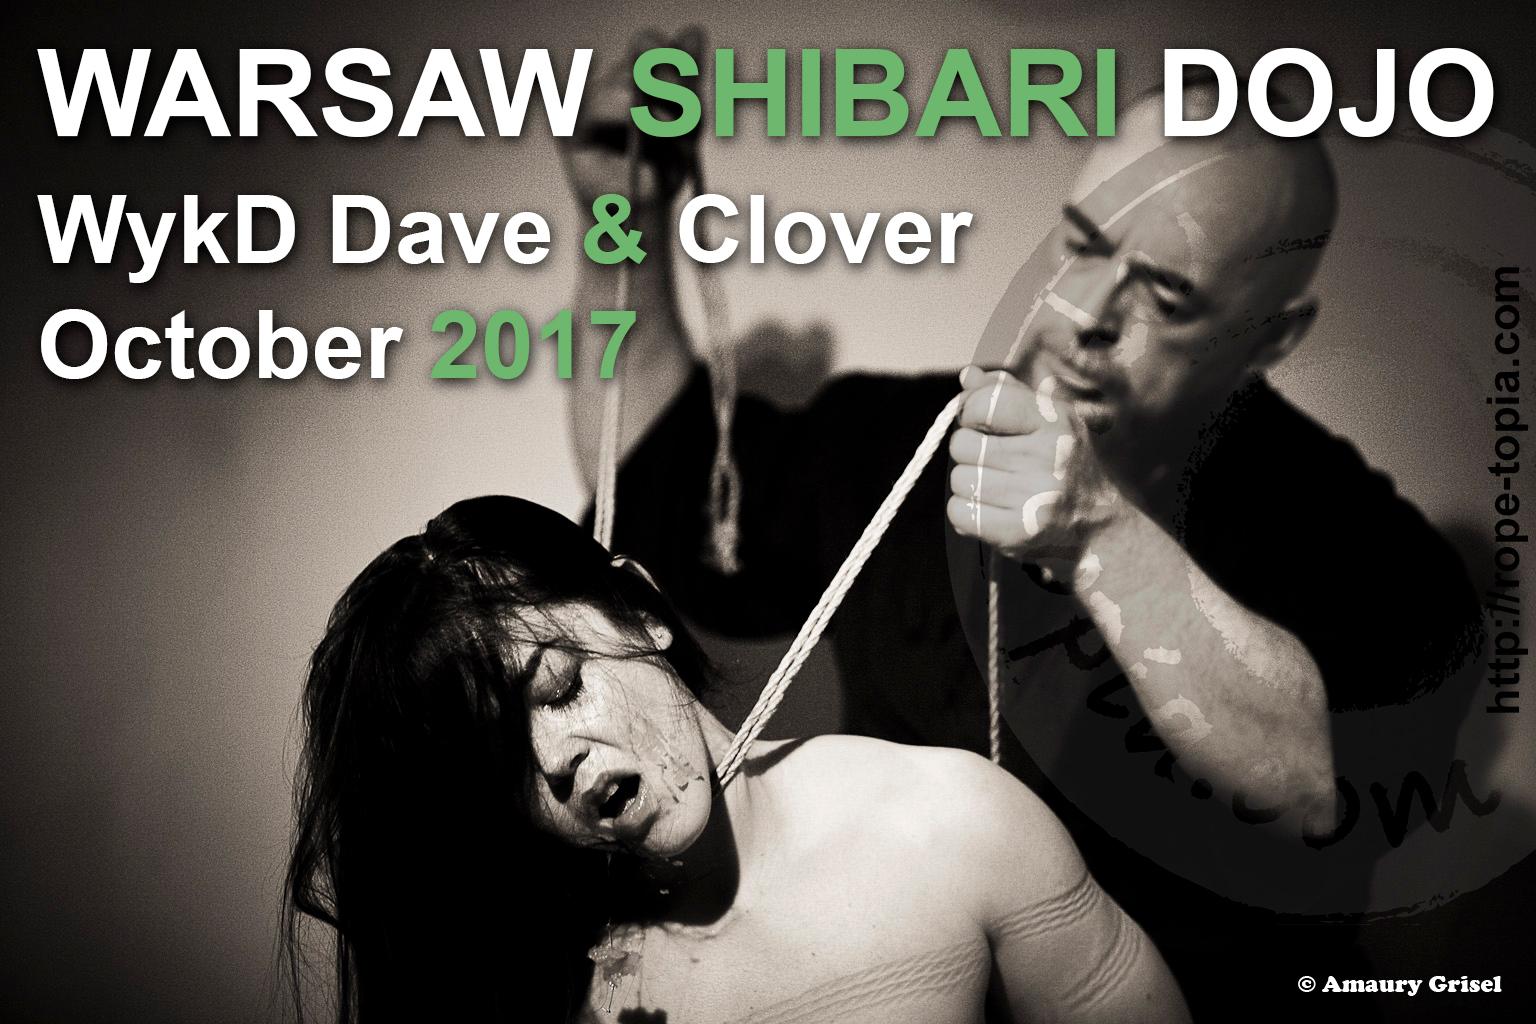 Wykd Dave & Clover Wasaw Shibari Dojo October 2017 2